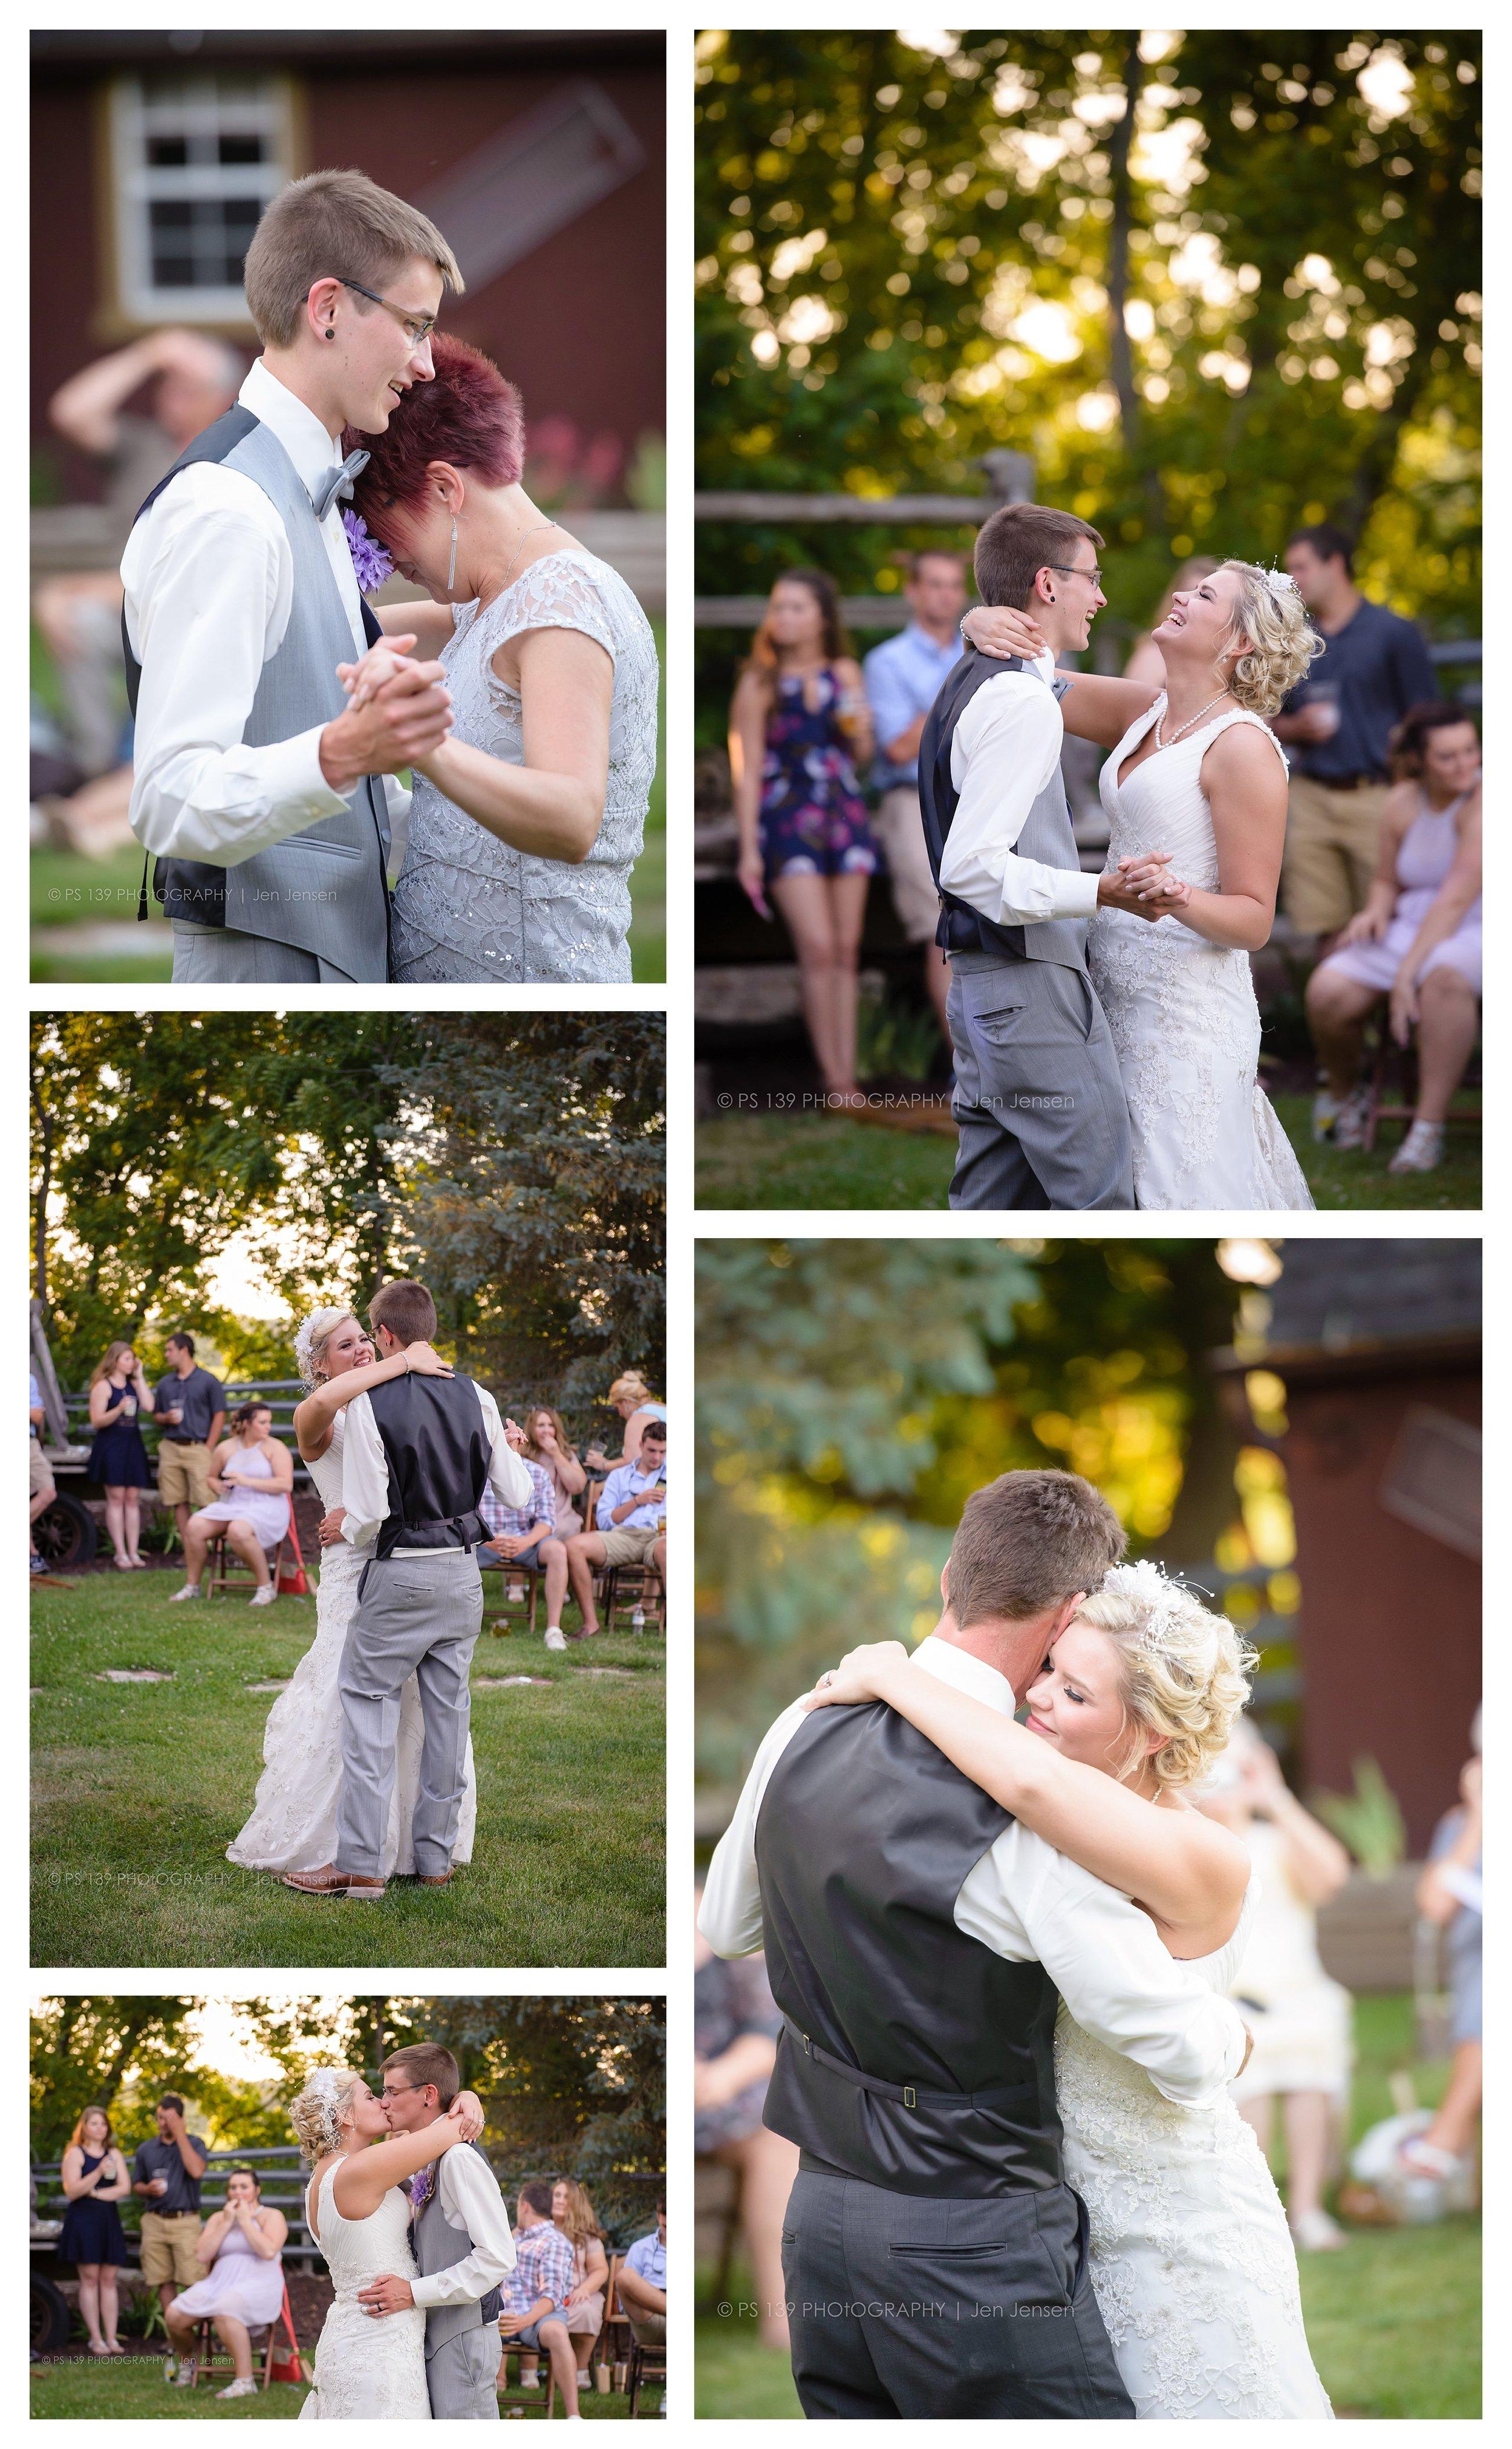 oregon Illinois oak lane farm wisconsin wedding photographer bayfield wi ps 139 photography jen jensen_0249.jpg